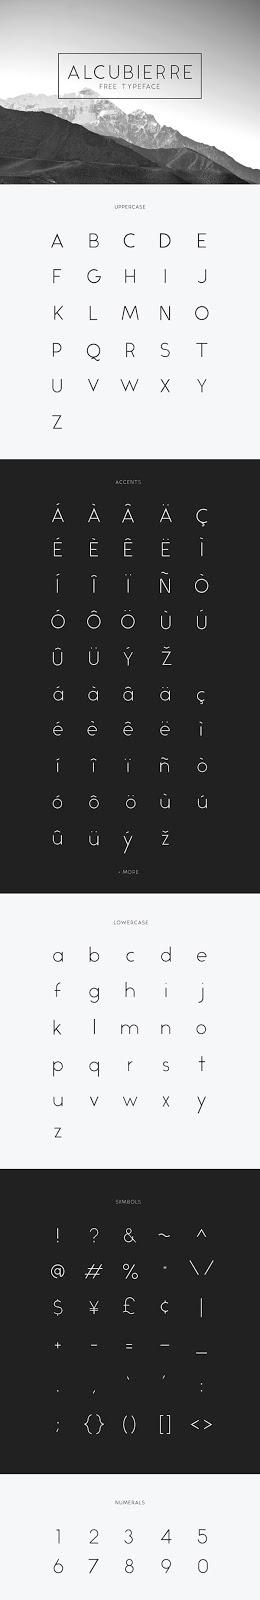 Download Gratis Sans Serif Komersial Font - Alcubierre Free Typeface